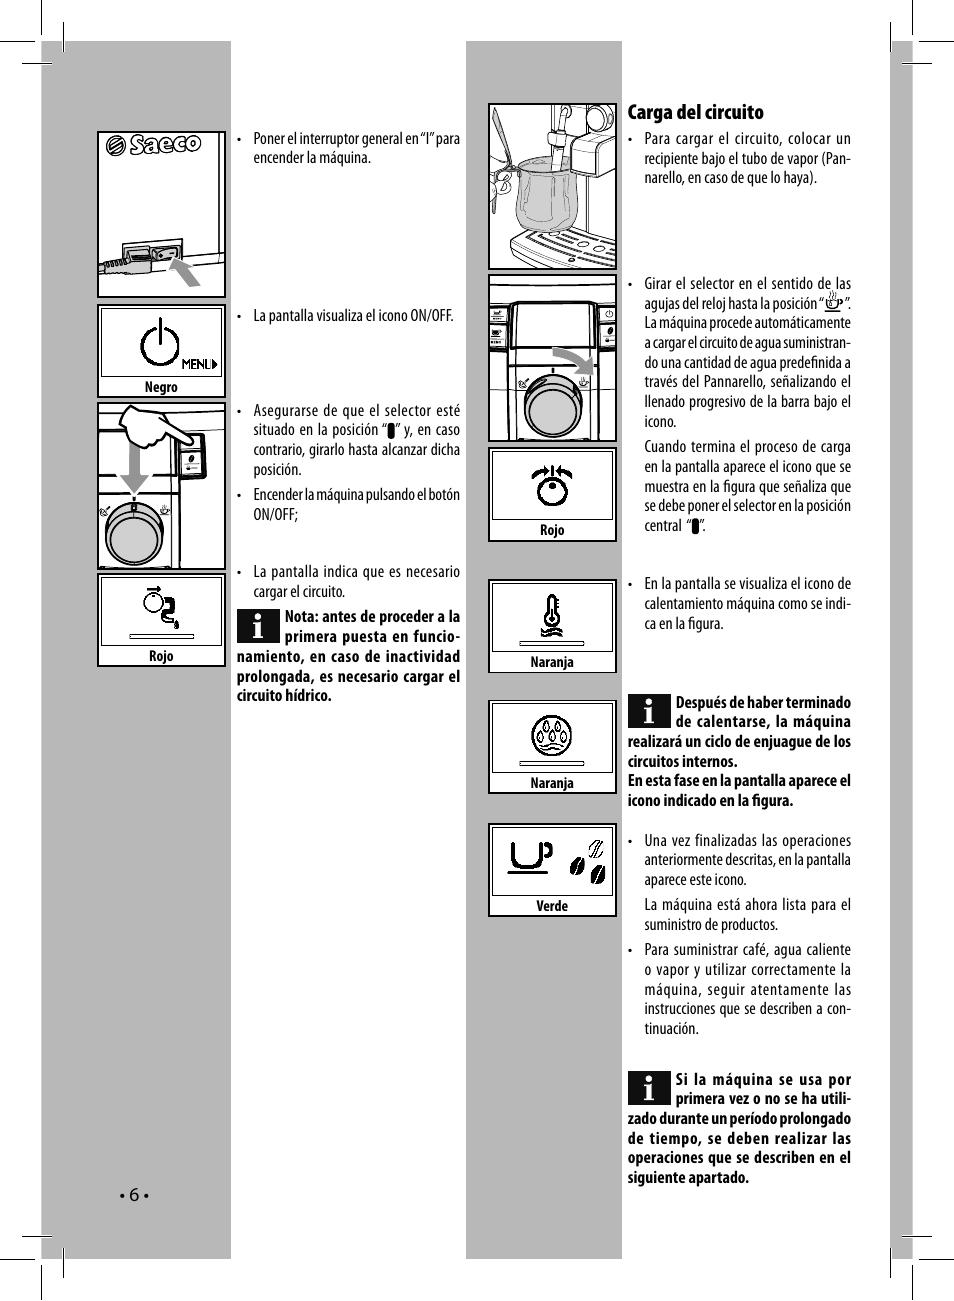 Circuito Hidrico : Carga del circuito philips saeco syntia cafetera expreso